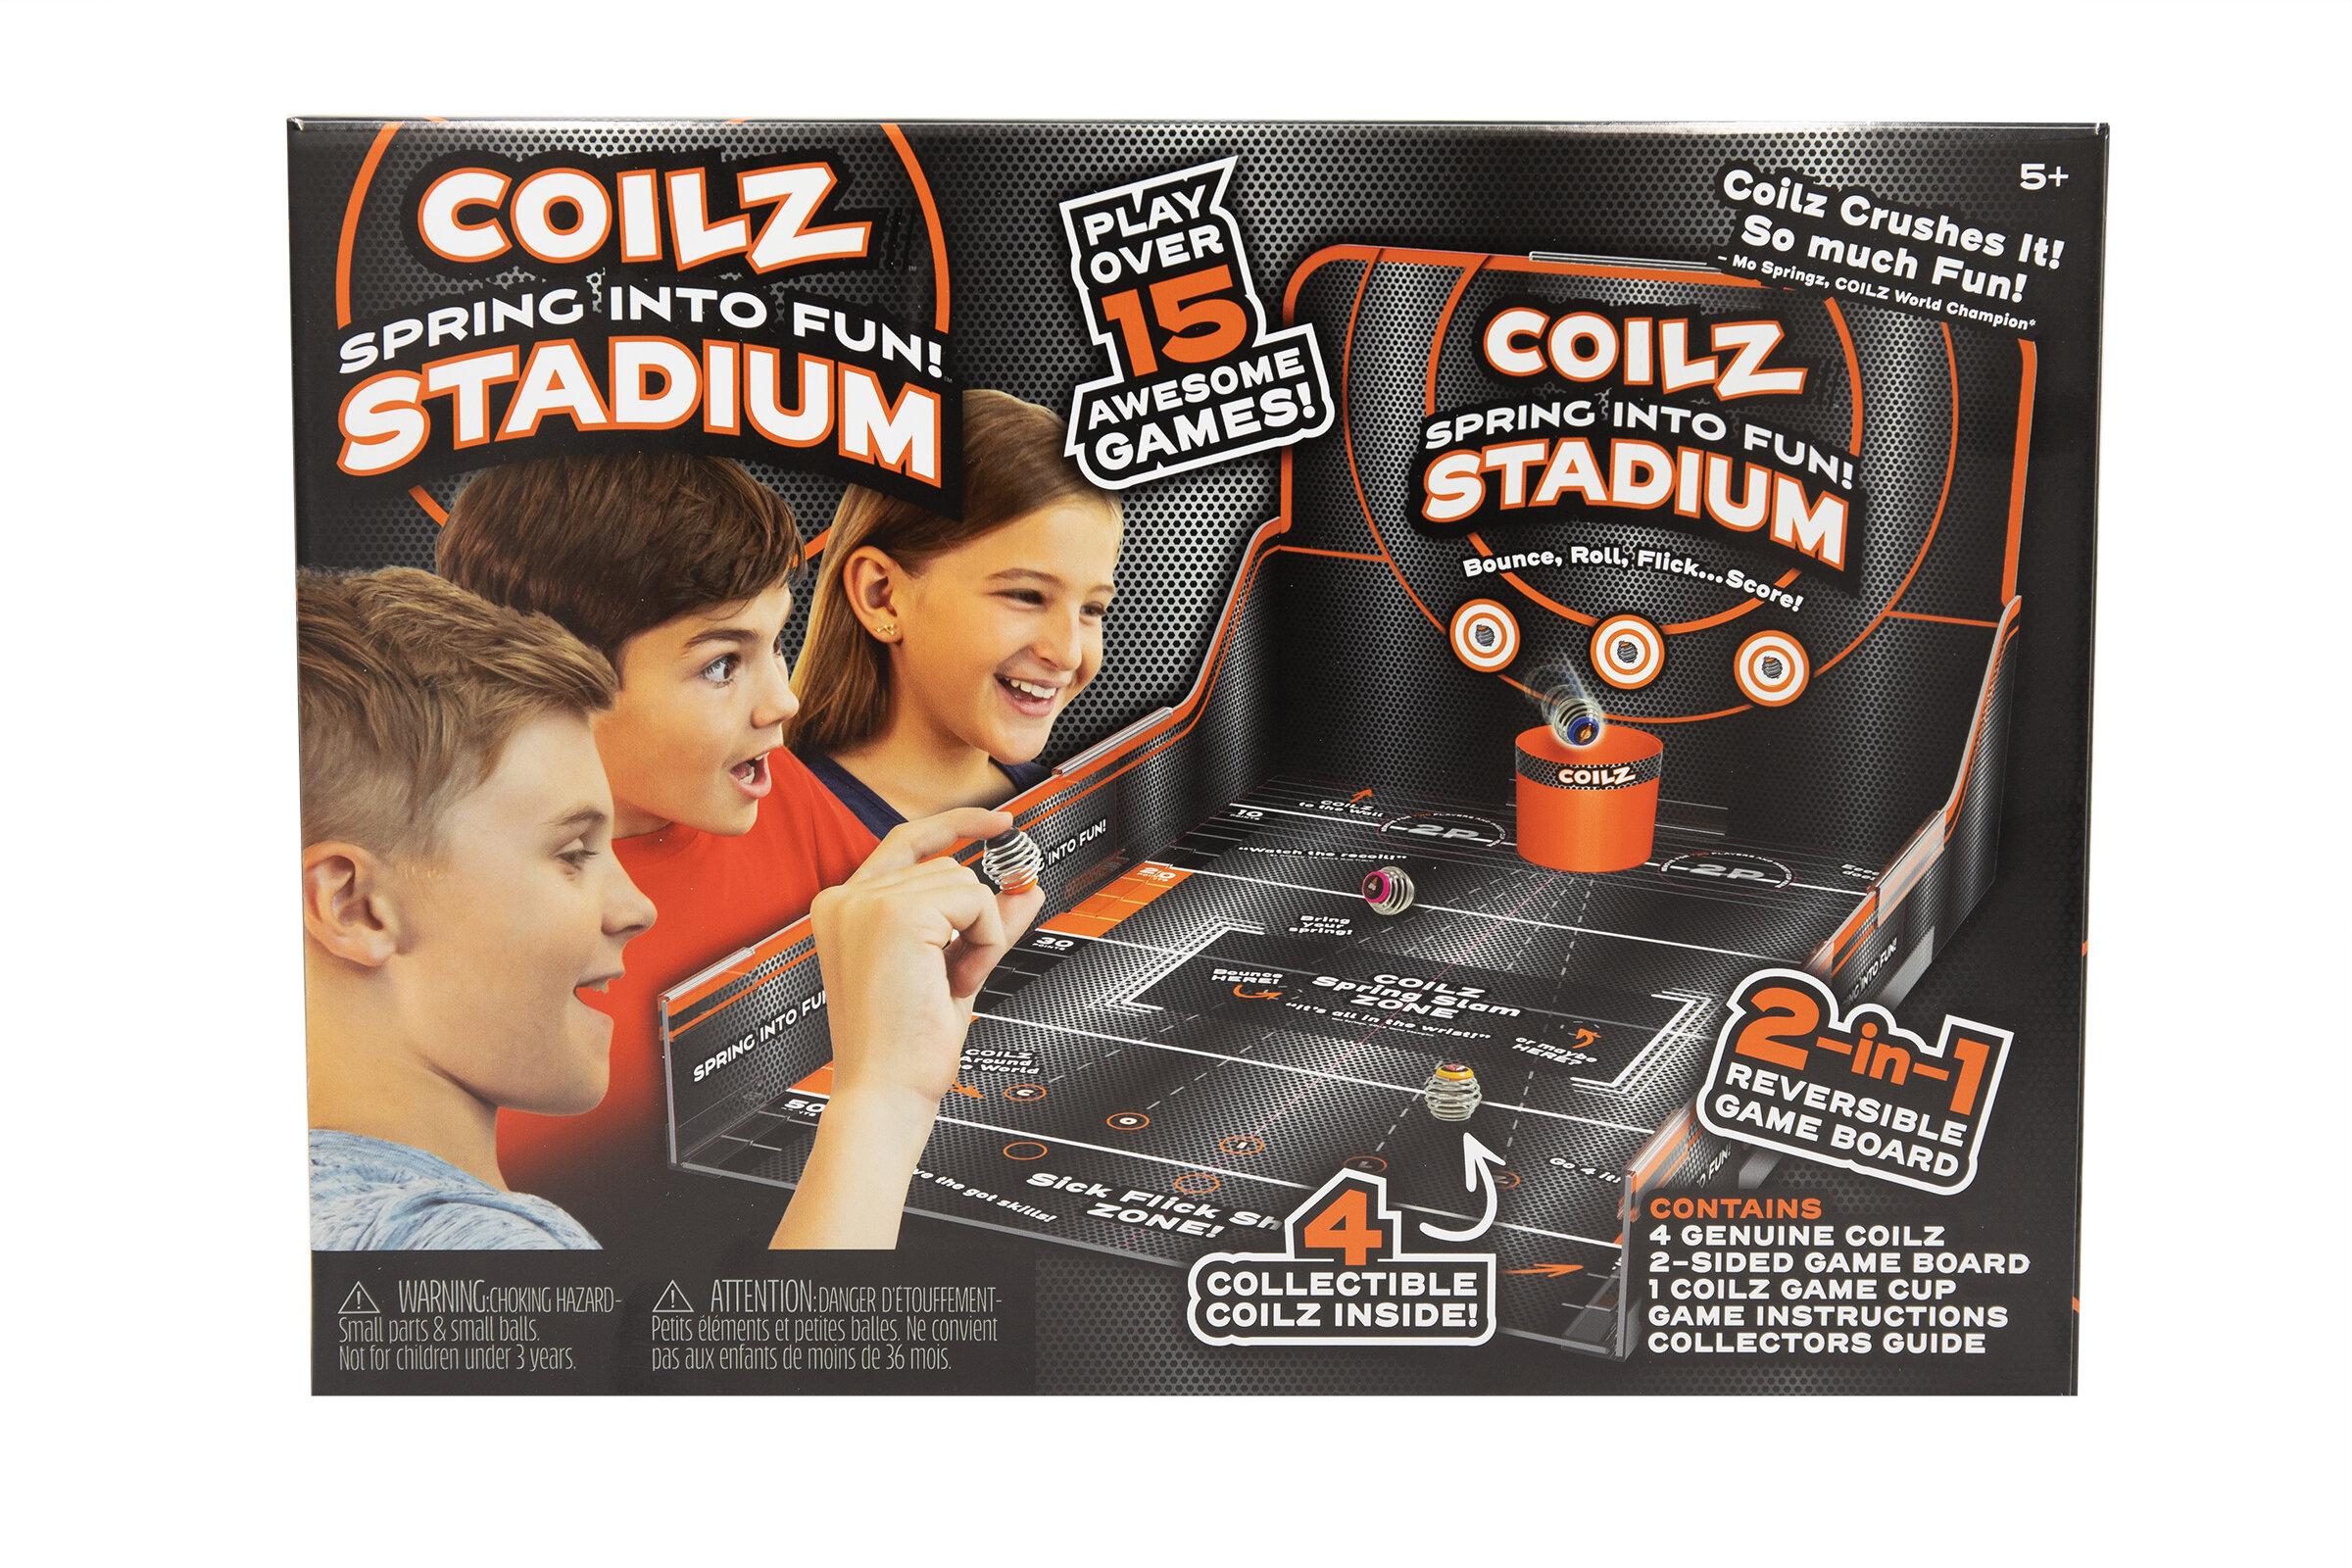 Coilz_Stadium_Package_1_-_hi-res.jpg